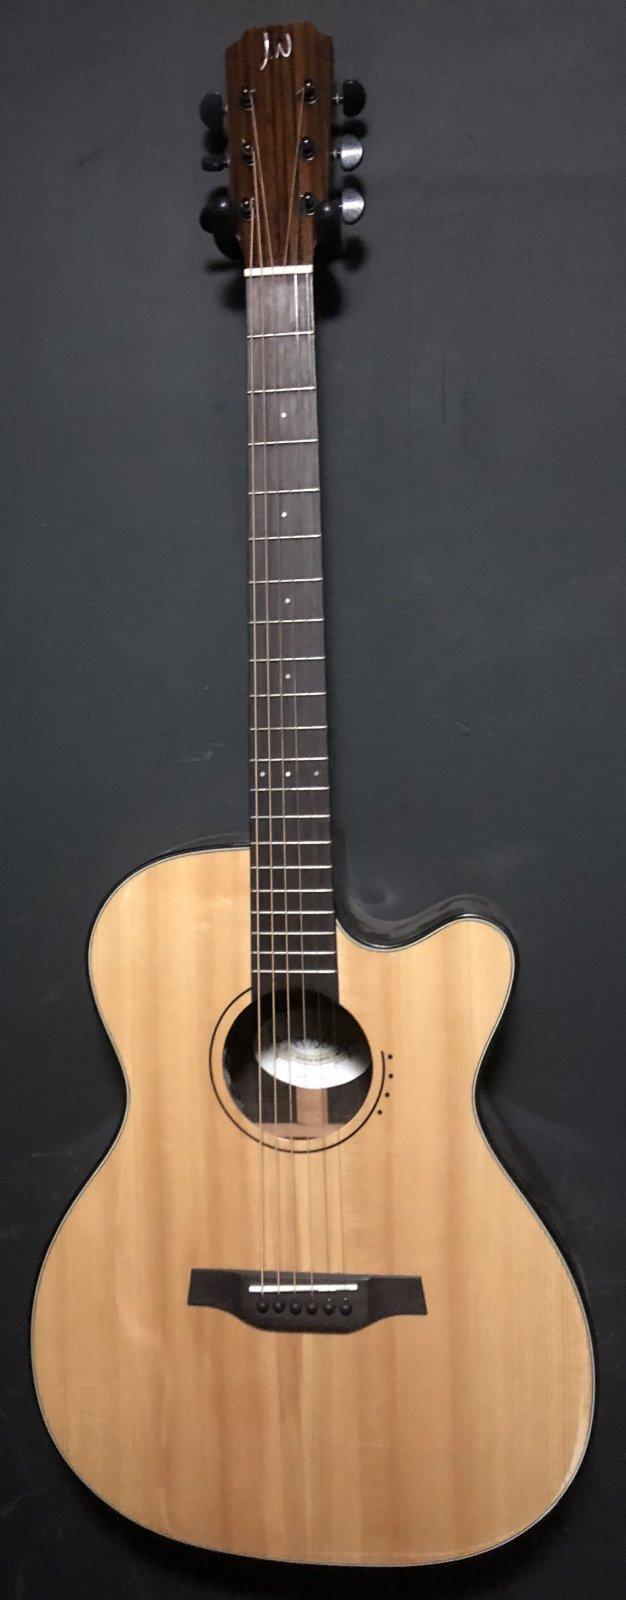 James Neligan LYN-ACFI Auditorium Size Electric Acoustic